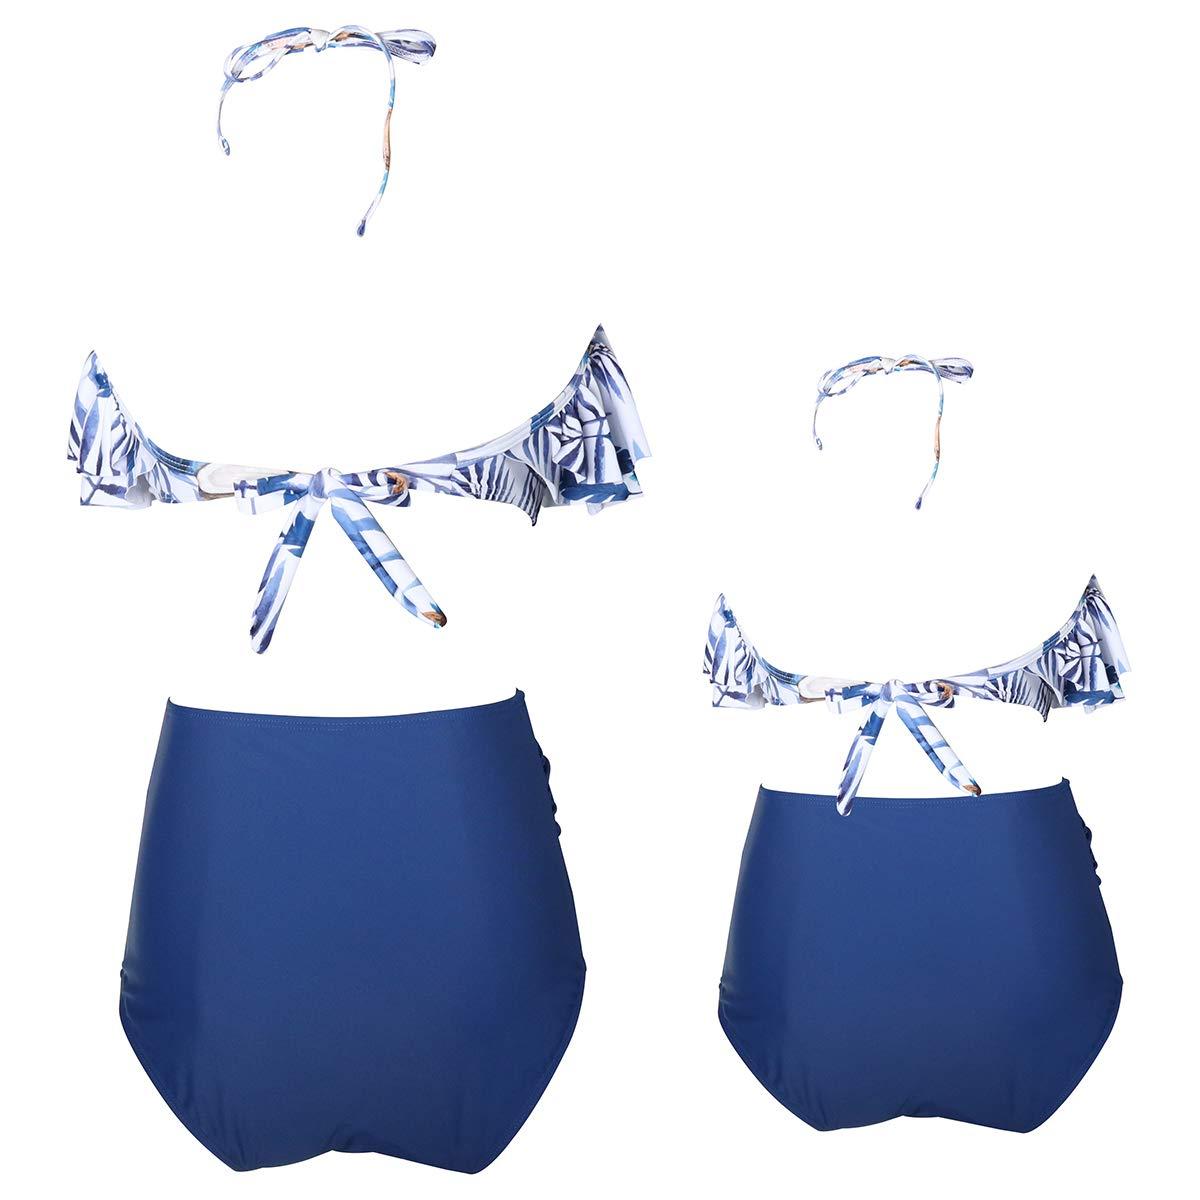 AIDEAONE Matching Swimwear Mother Daughter High Waist Bikini Two Piece Ruffled Swimsuits